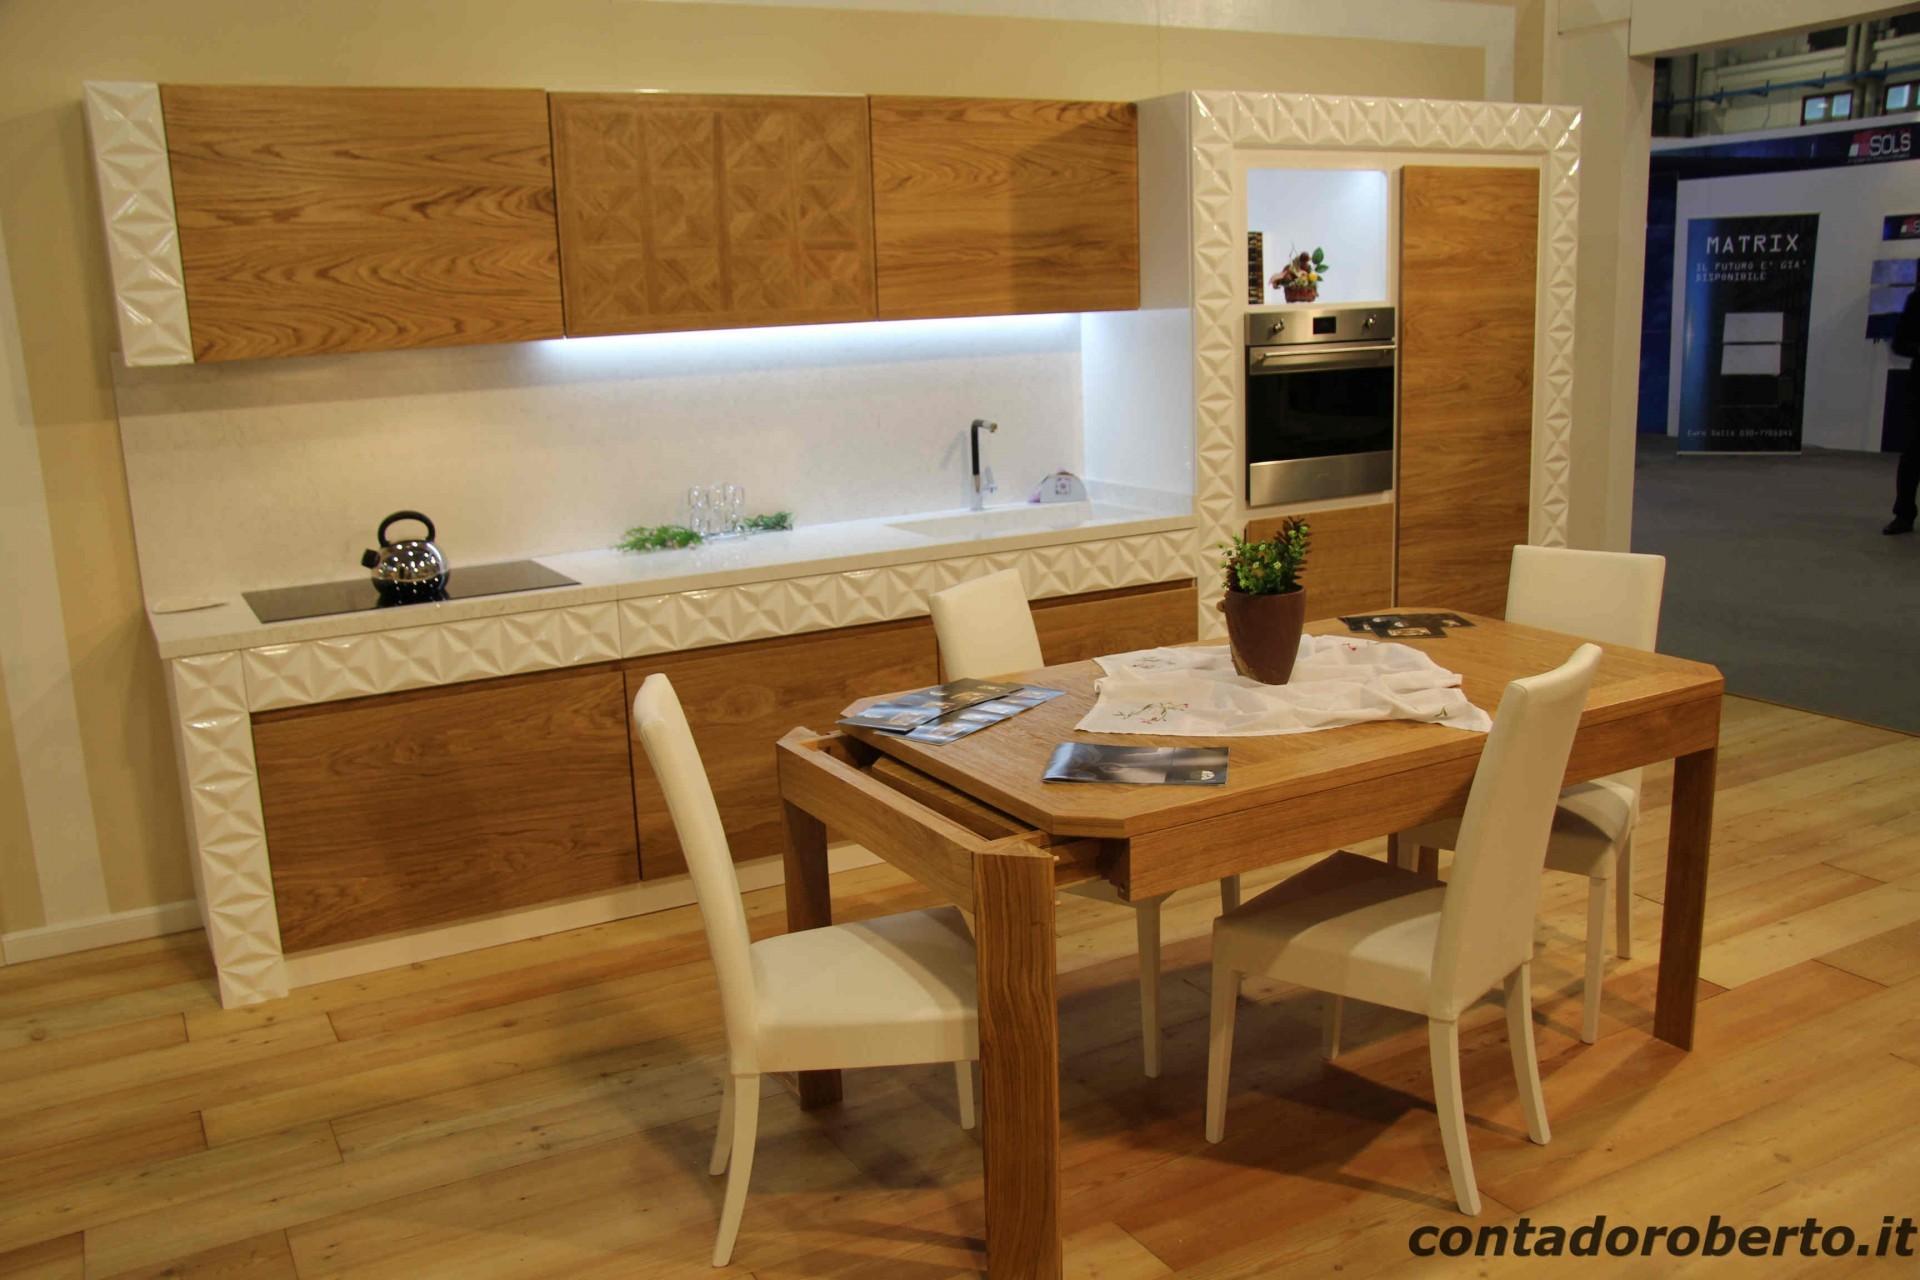 cucina-in-legno-affi-verona-rovere-naturle-laccato-lucido-affi.jpg